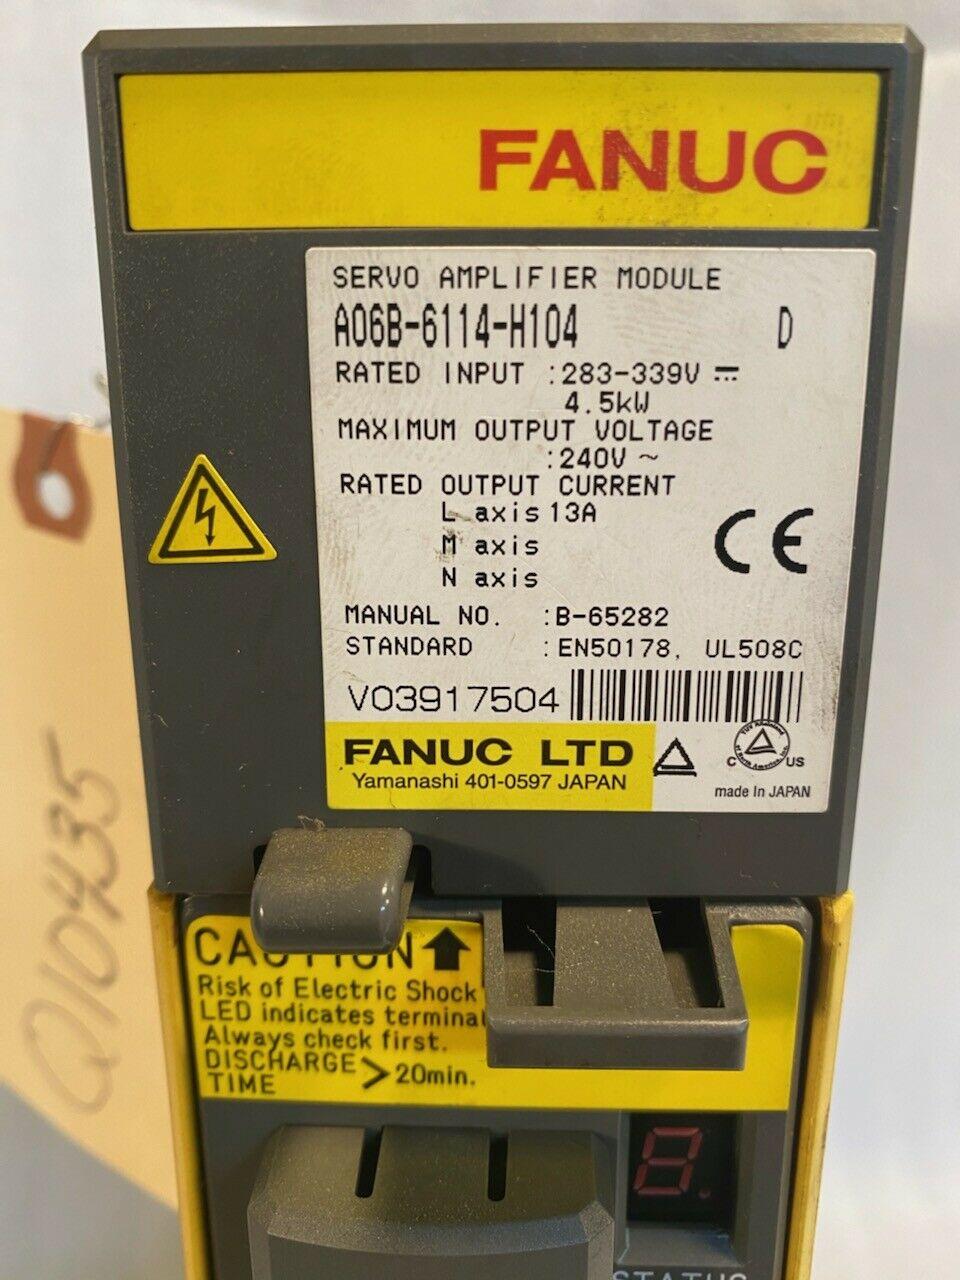 Fanuc Servo Amplifier A06B-6114-H104 D, Servo Drive, Tested, 30 Day Return